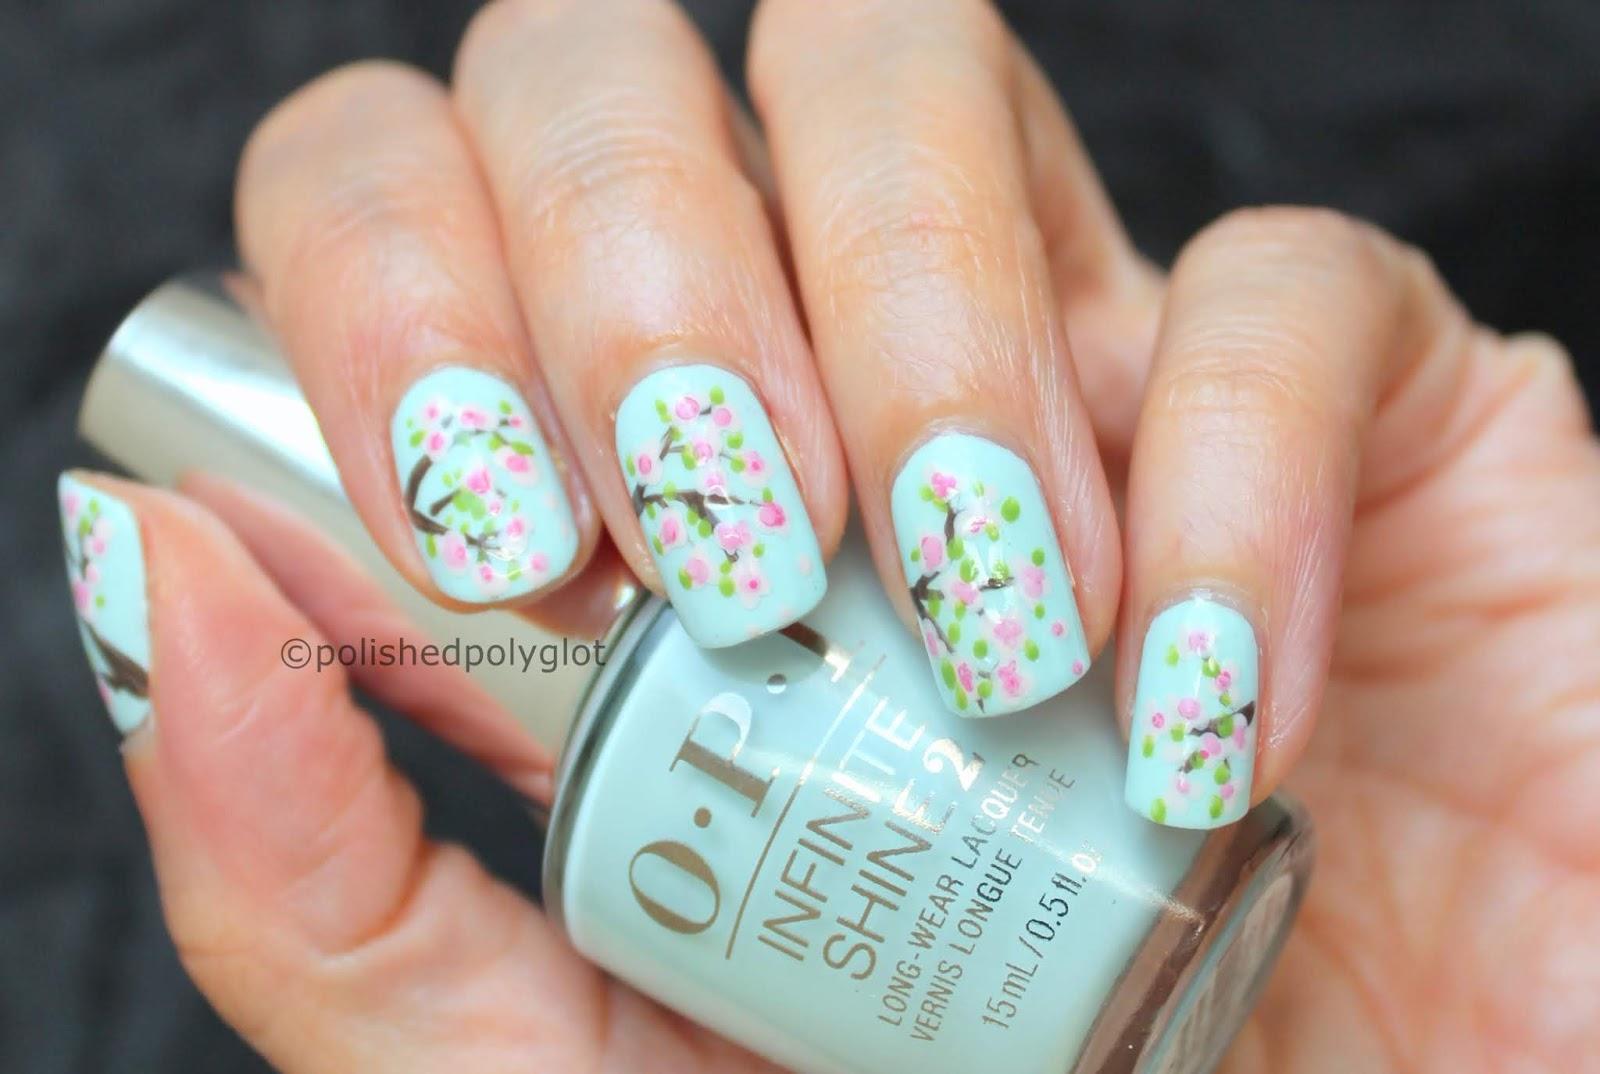 Nail Art Cherry Blossoms Manicure Polished Polyglot